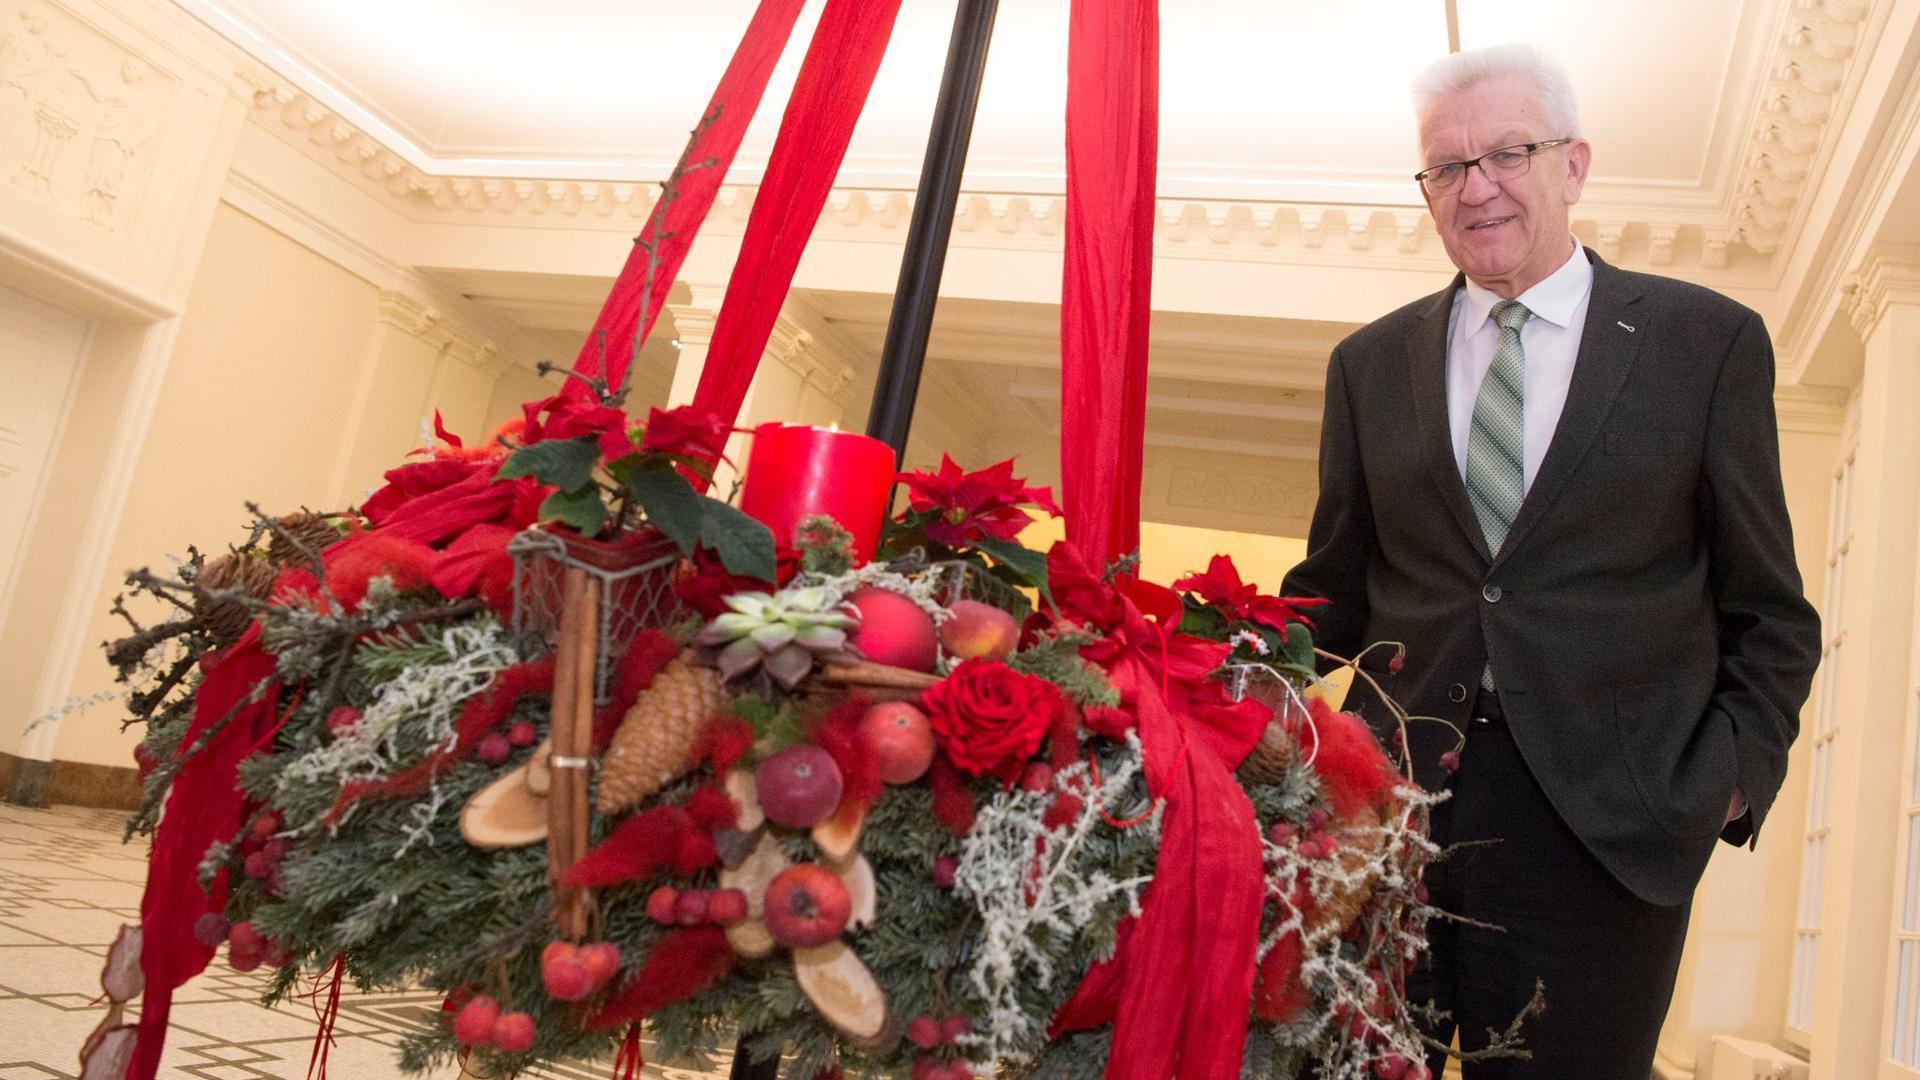 Ministerpräsident Winfried Kretschmann (Grüne) steht im Staatsministerium an einem Adventskranz.